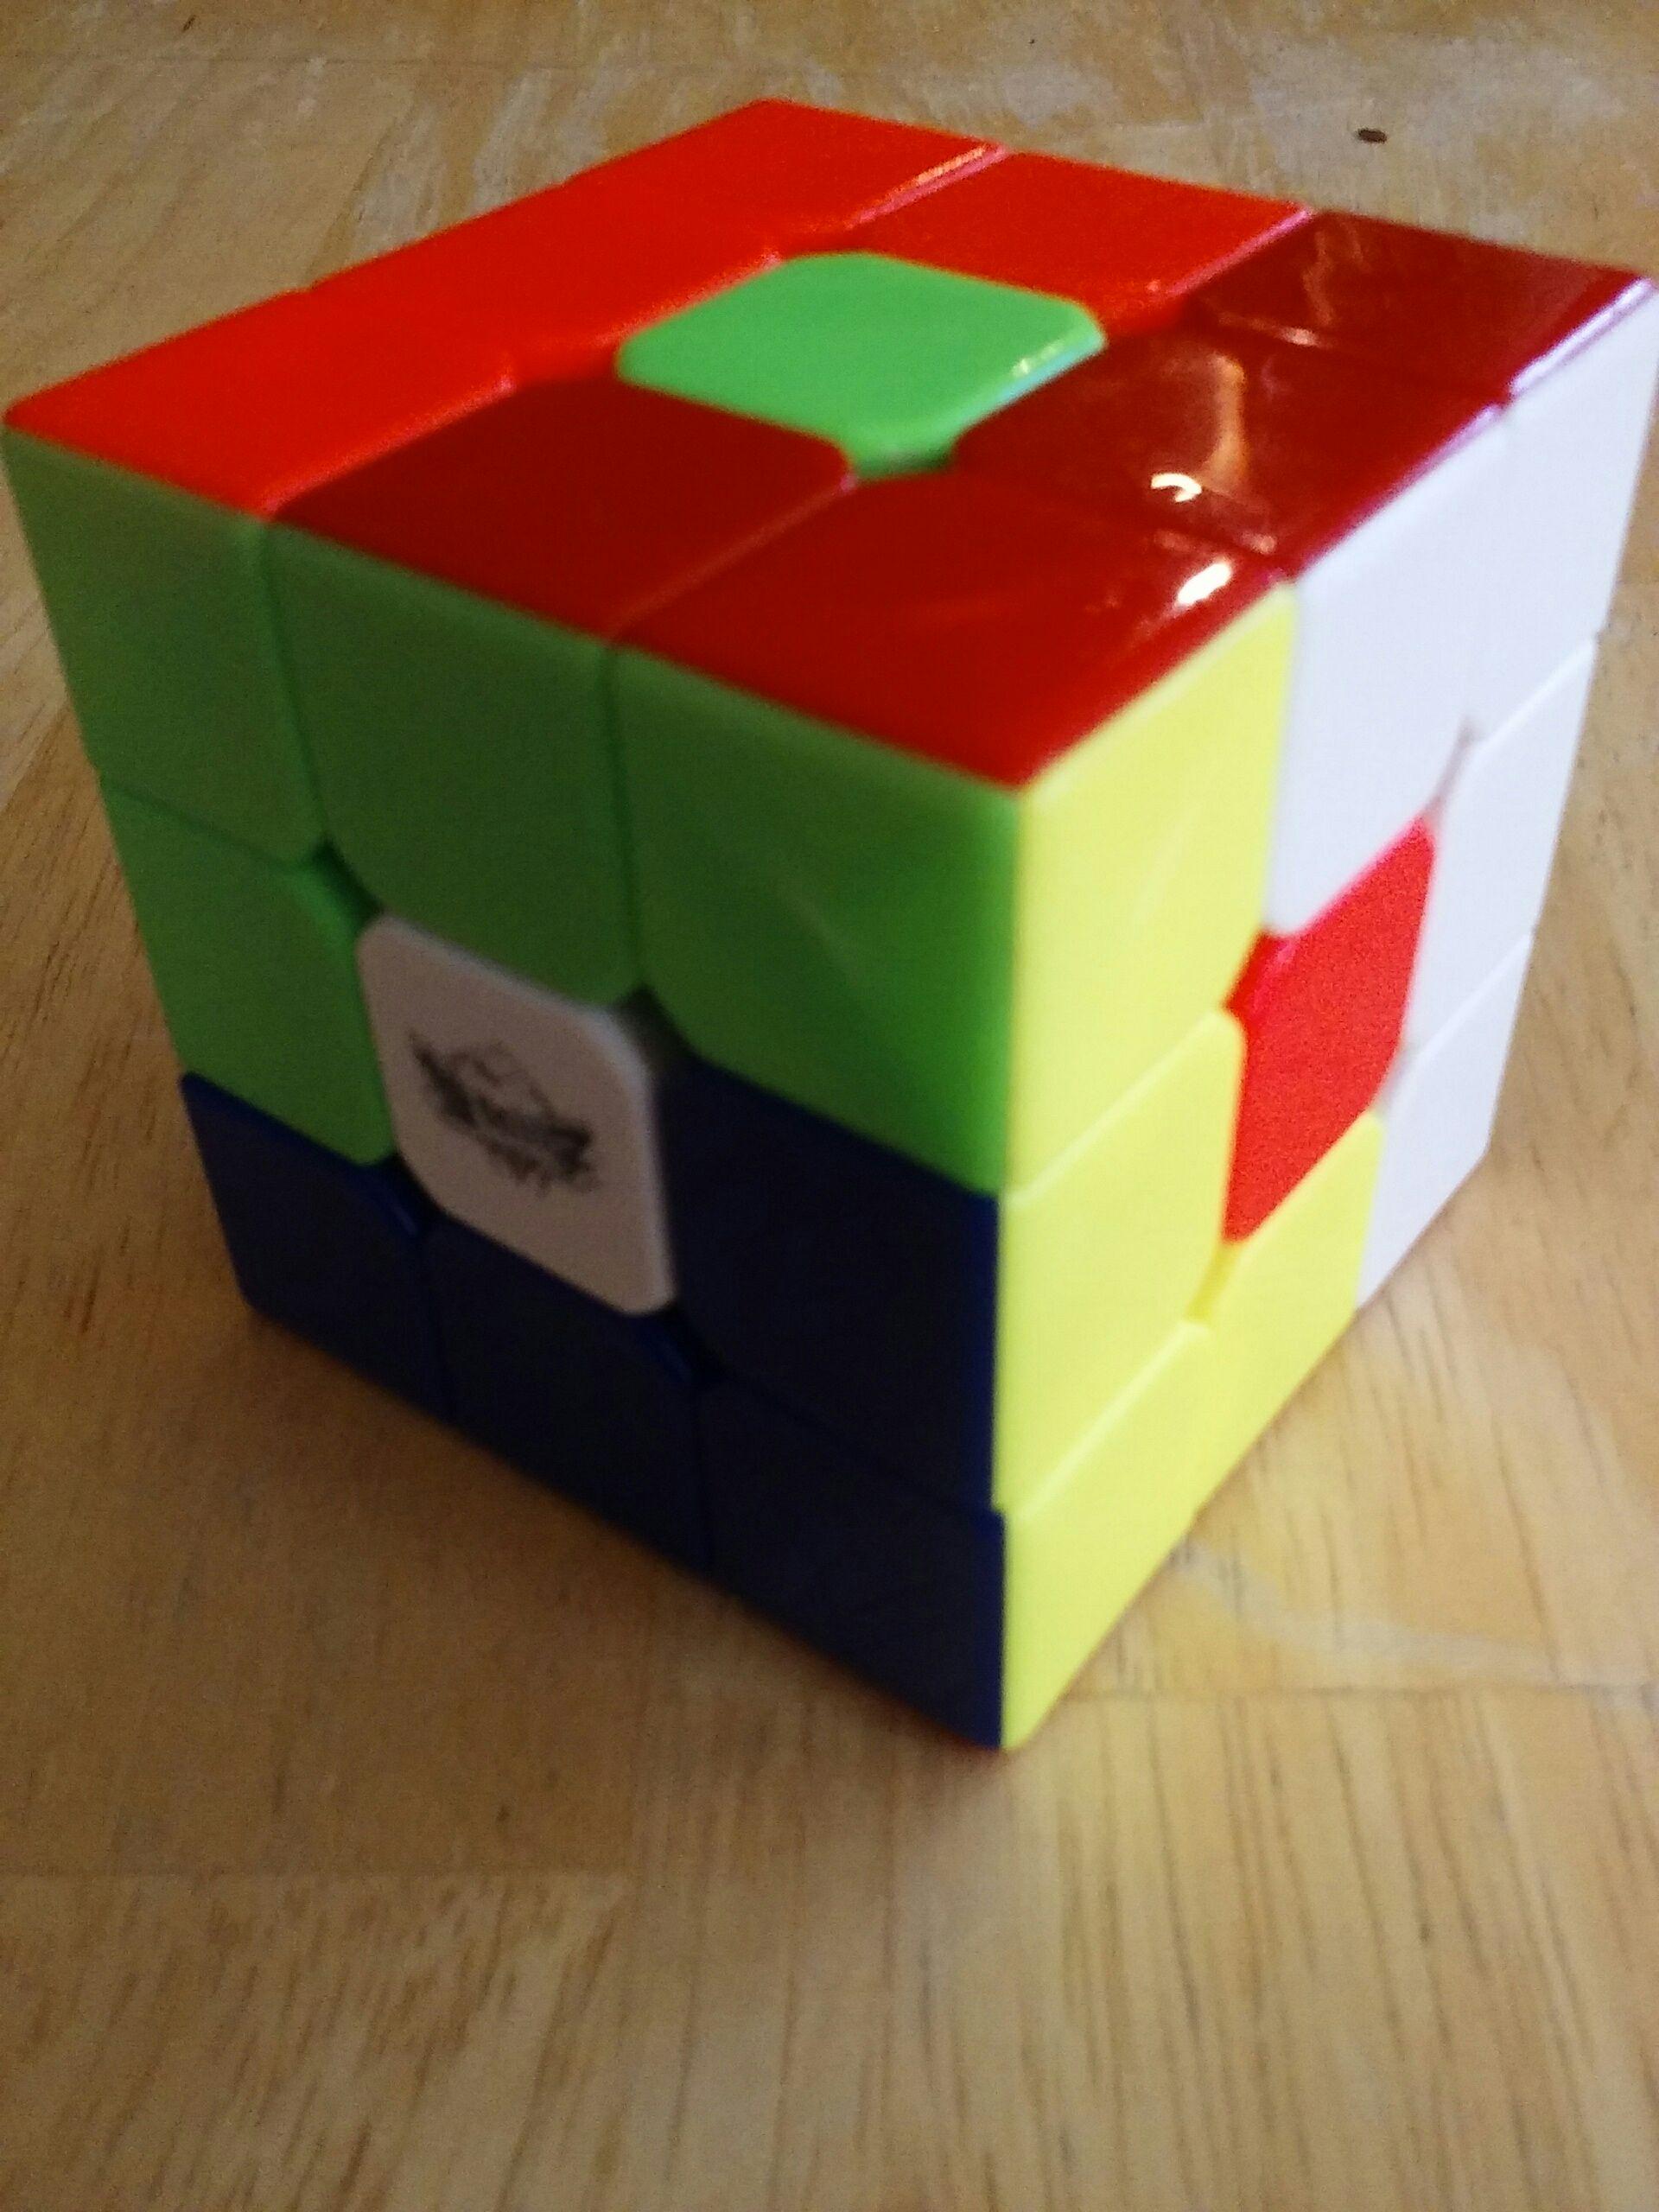 Picture of Rubik's Cube Tricks: Ying Yang